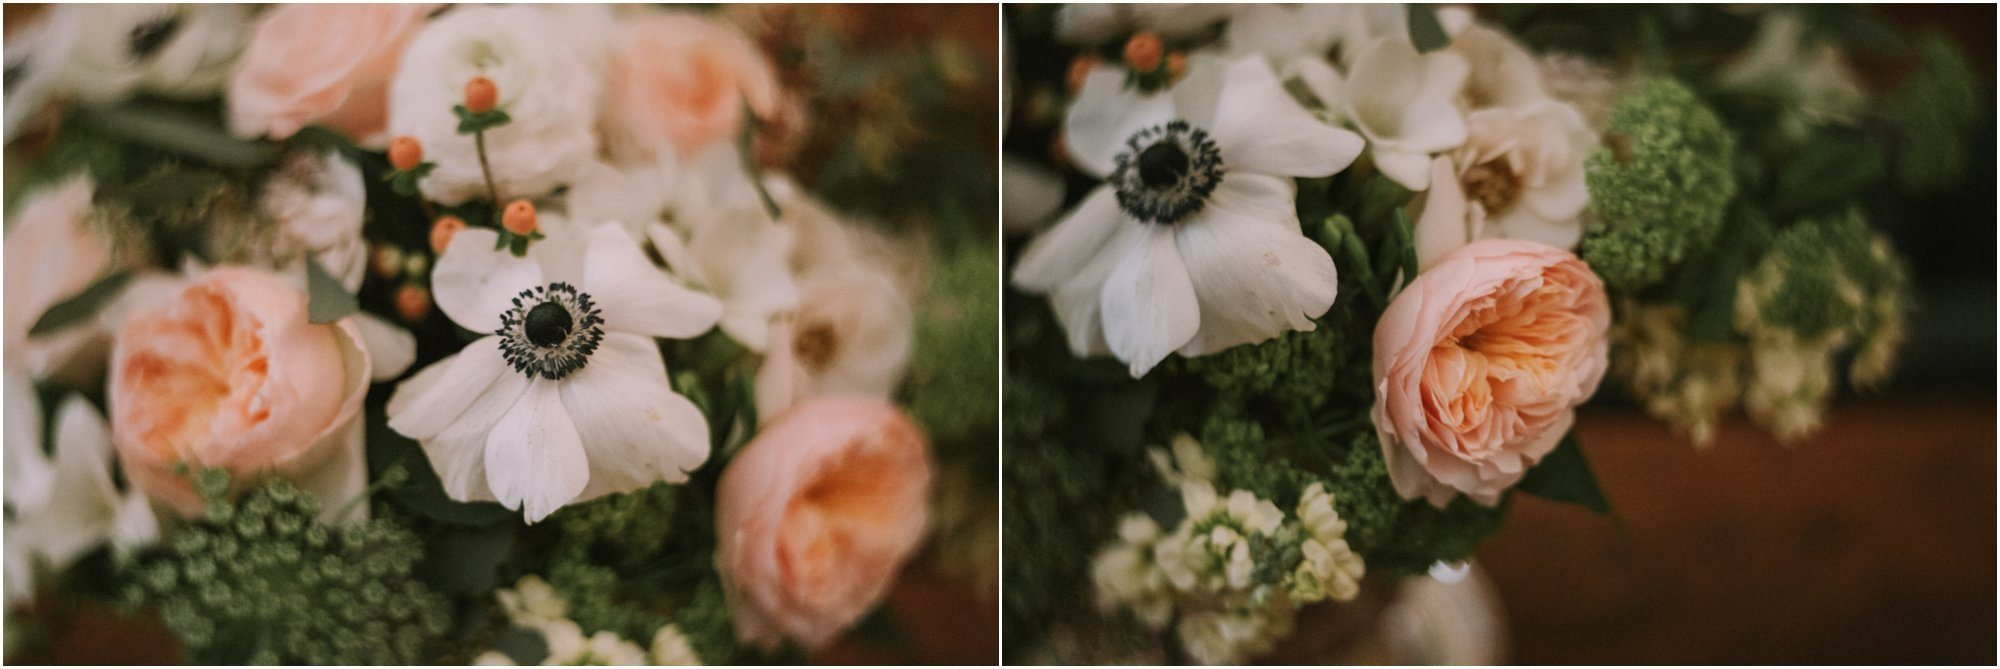 28Blue Rose Photography